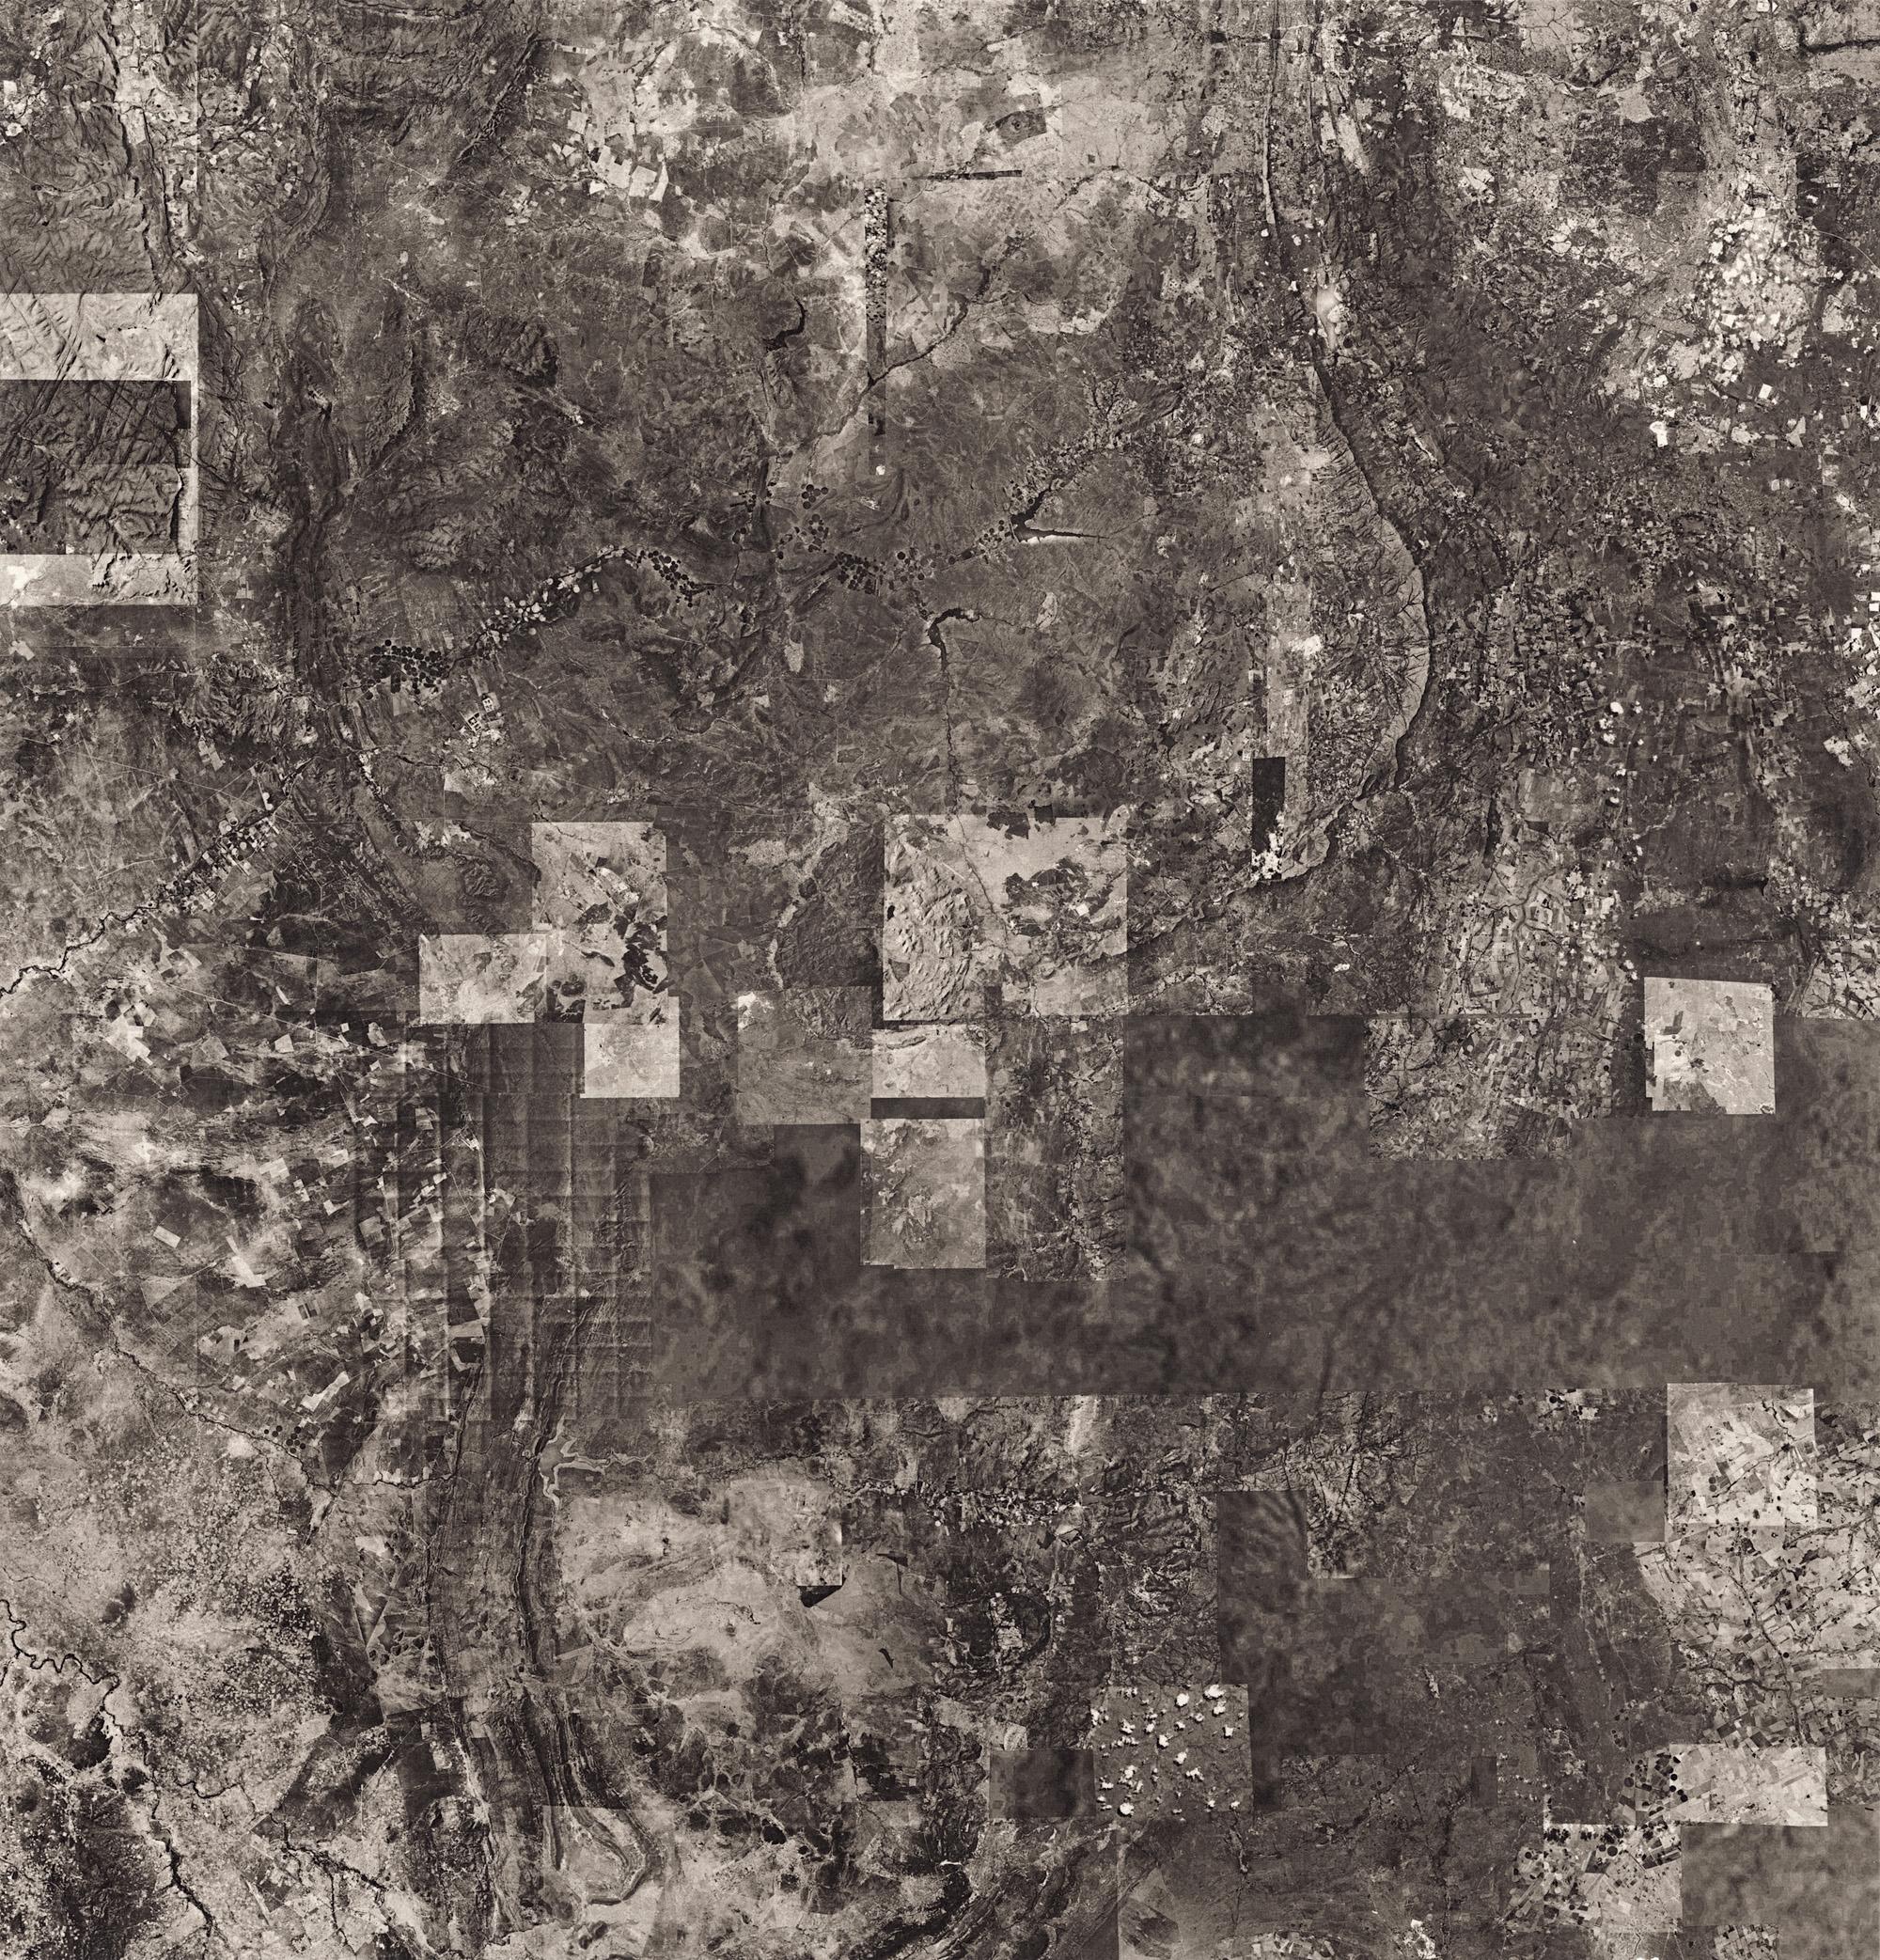 Bushveld Complex Platinum Mines, South Africa